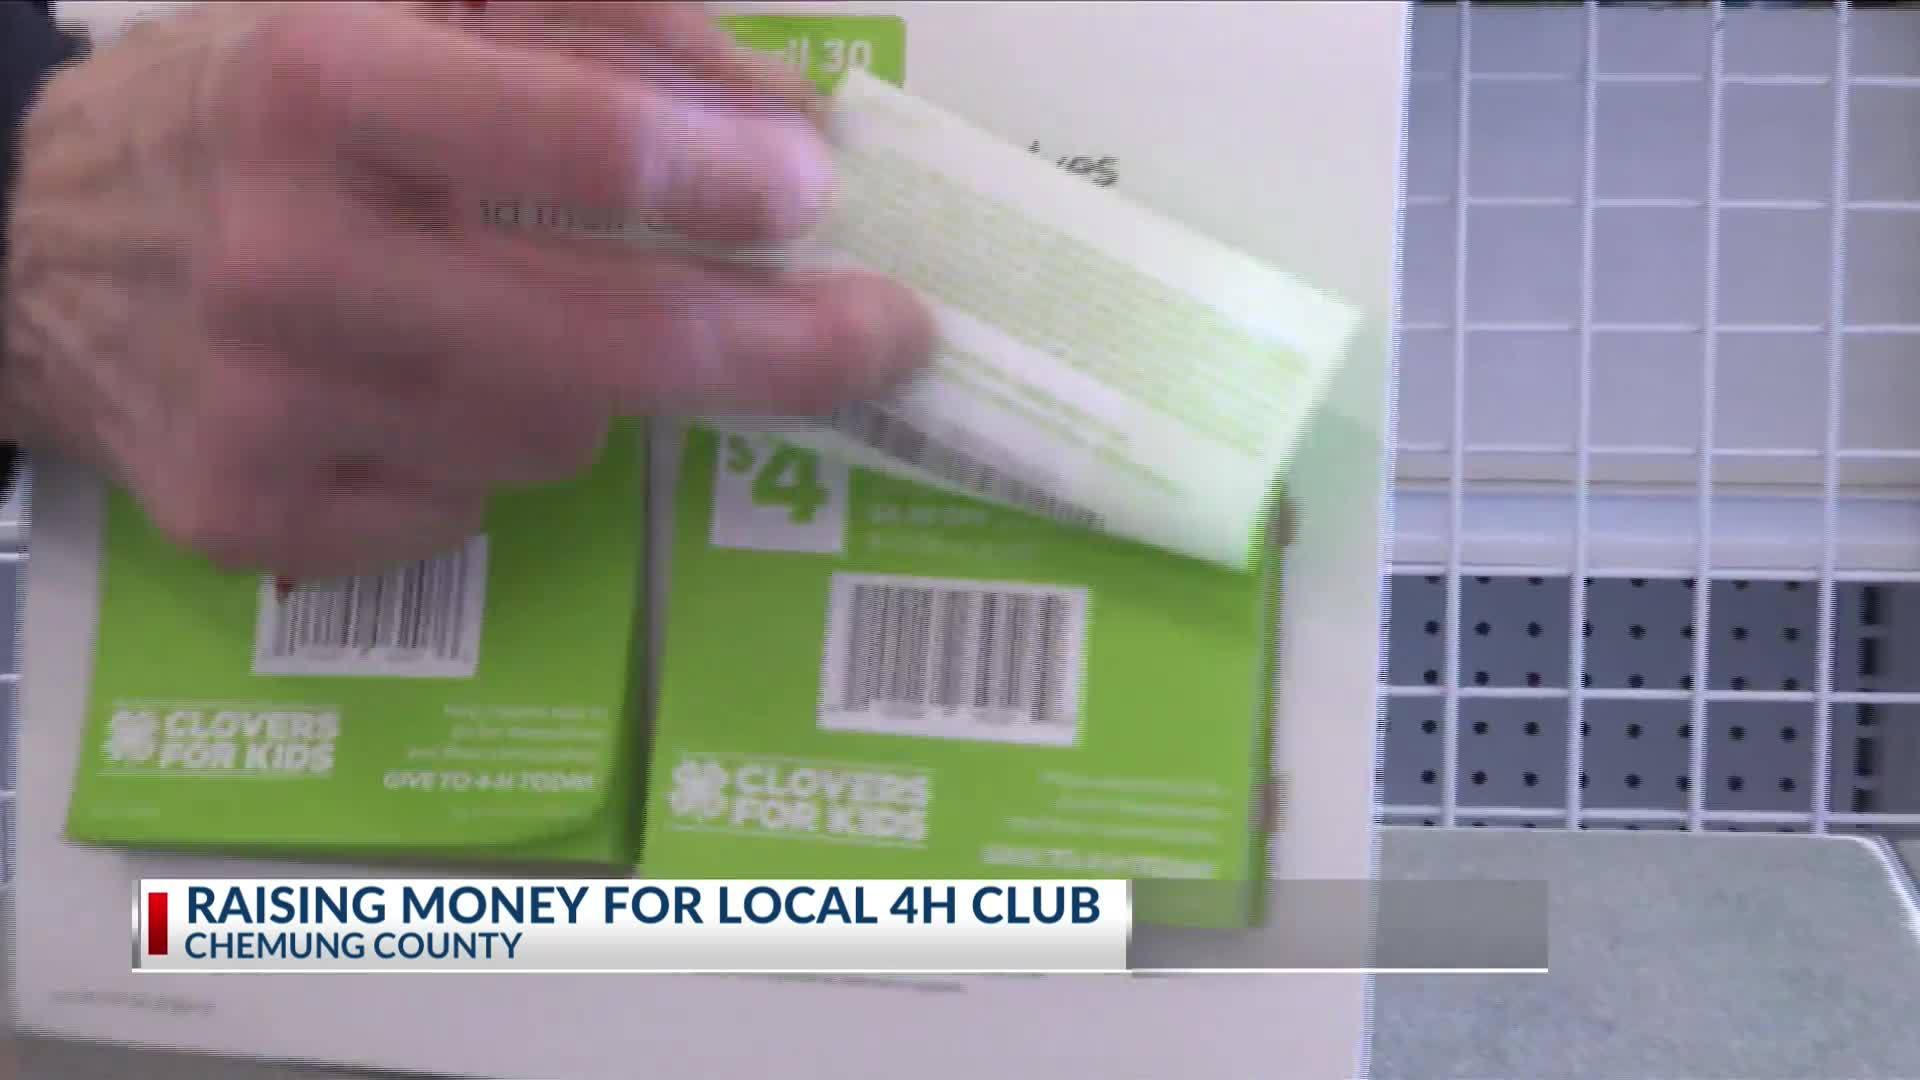 Chemung_County_4H_club_raising_money_for_4_20190315224420